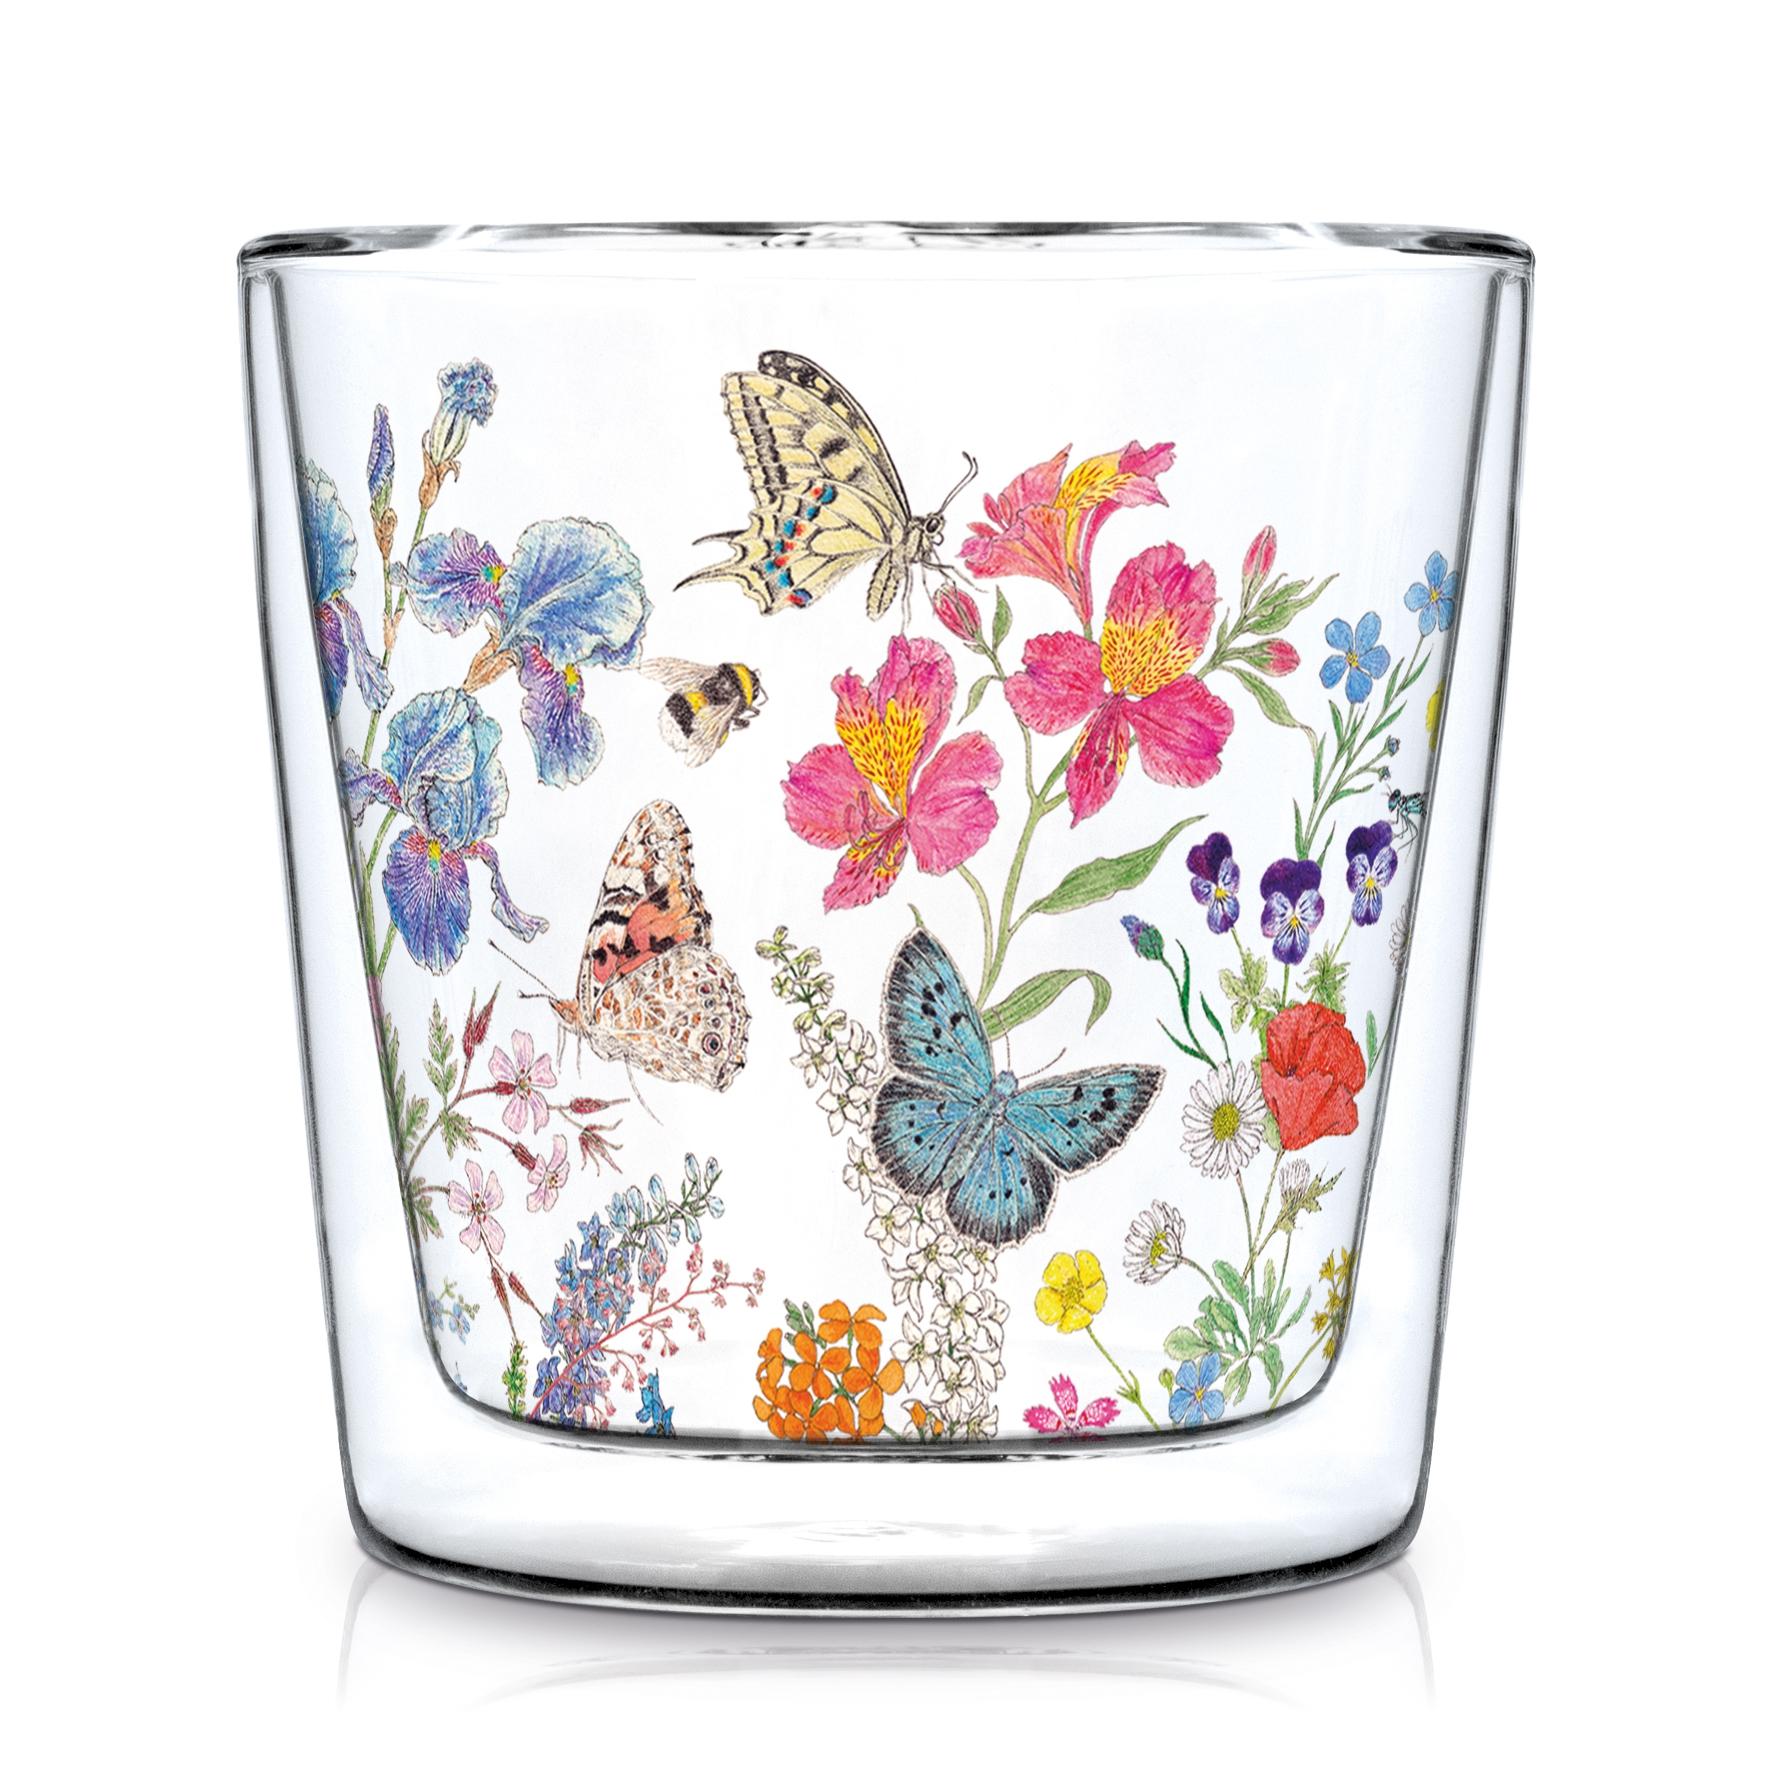 双层玻璃 - Nature Romance Trendglas DW